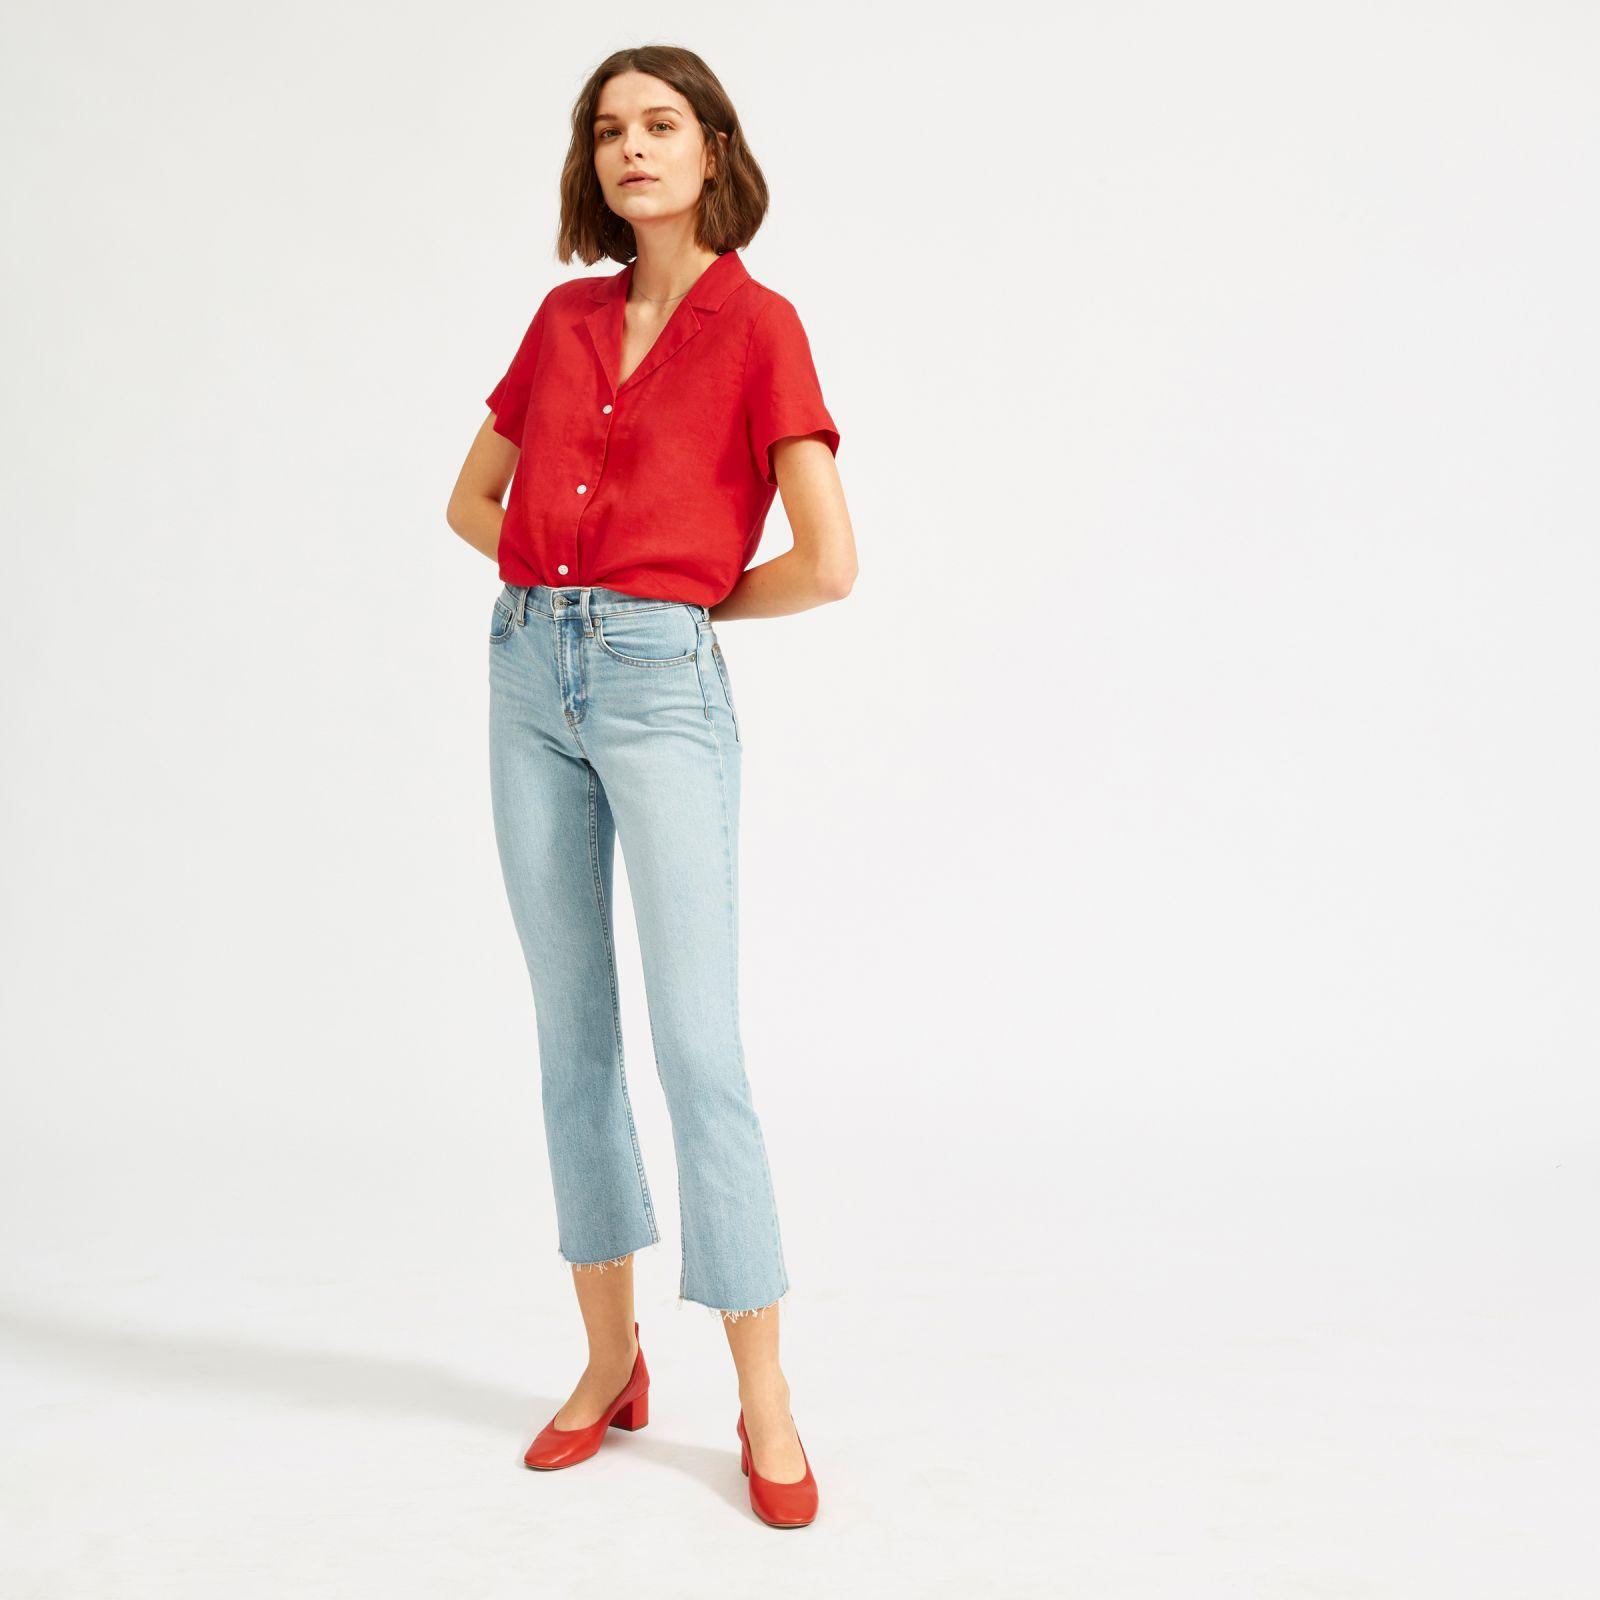 women's linen notch short-sleeve shirt by everlane in tomato, size 16